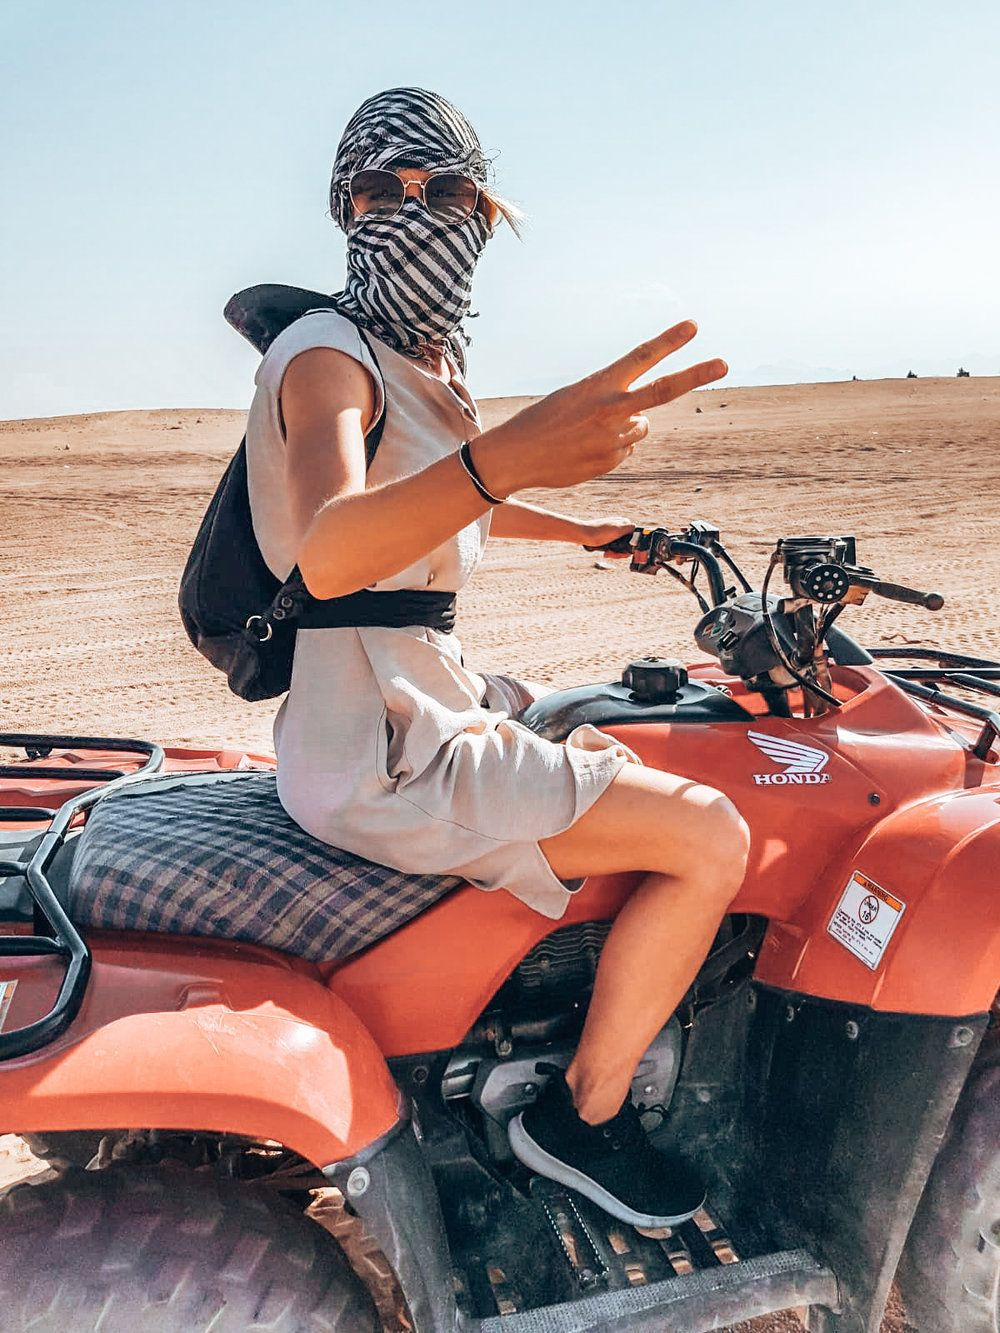 Quad Bike Safari In Egypt Quadbike Desertrace Desert Safari